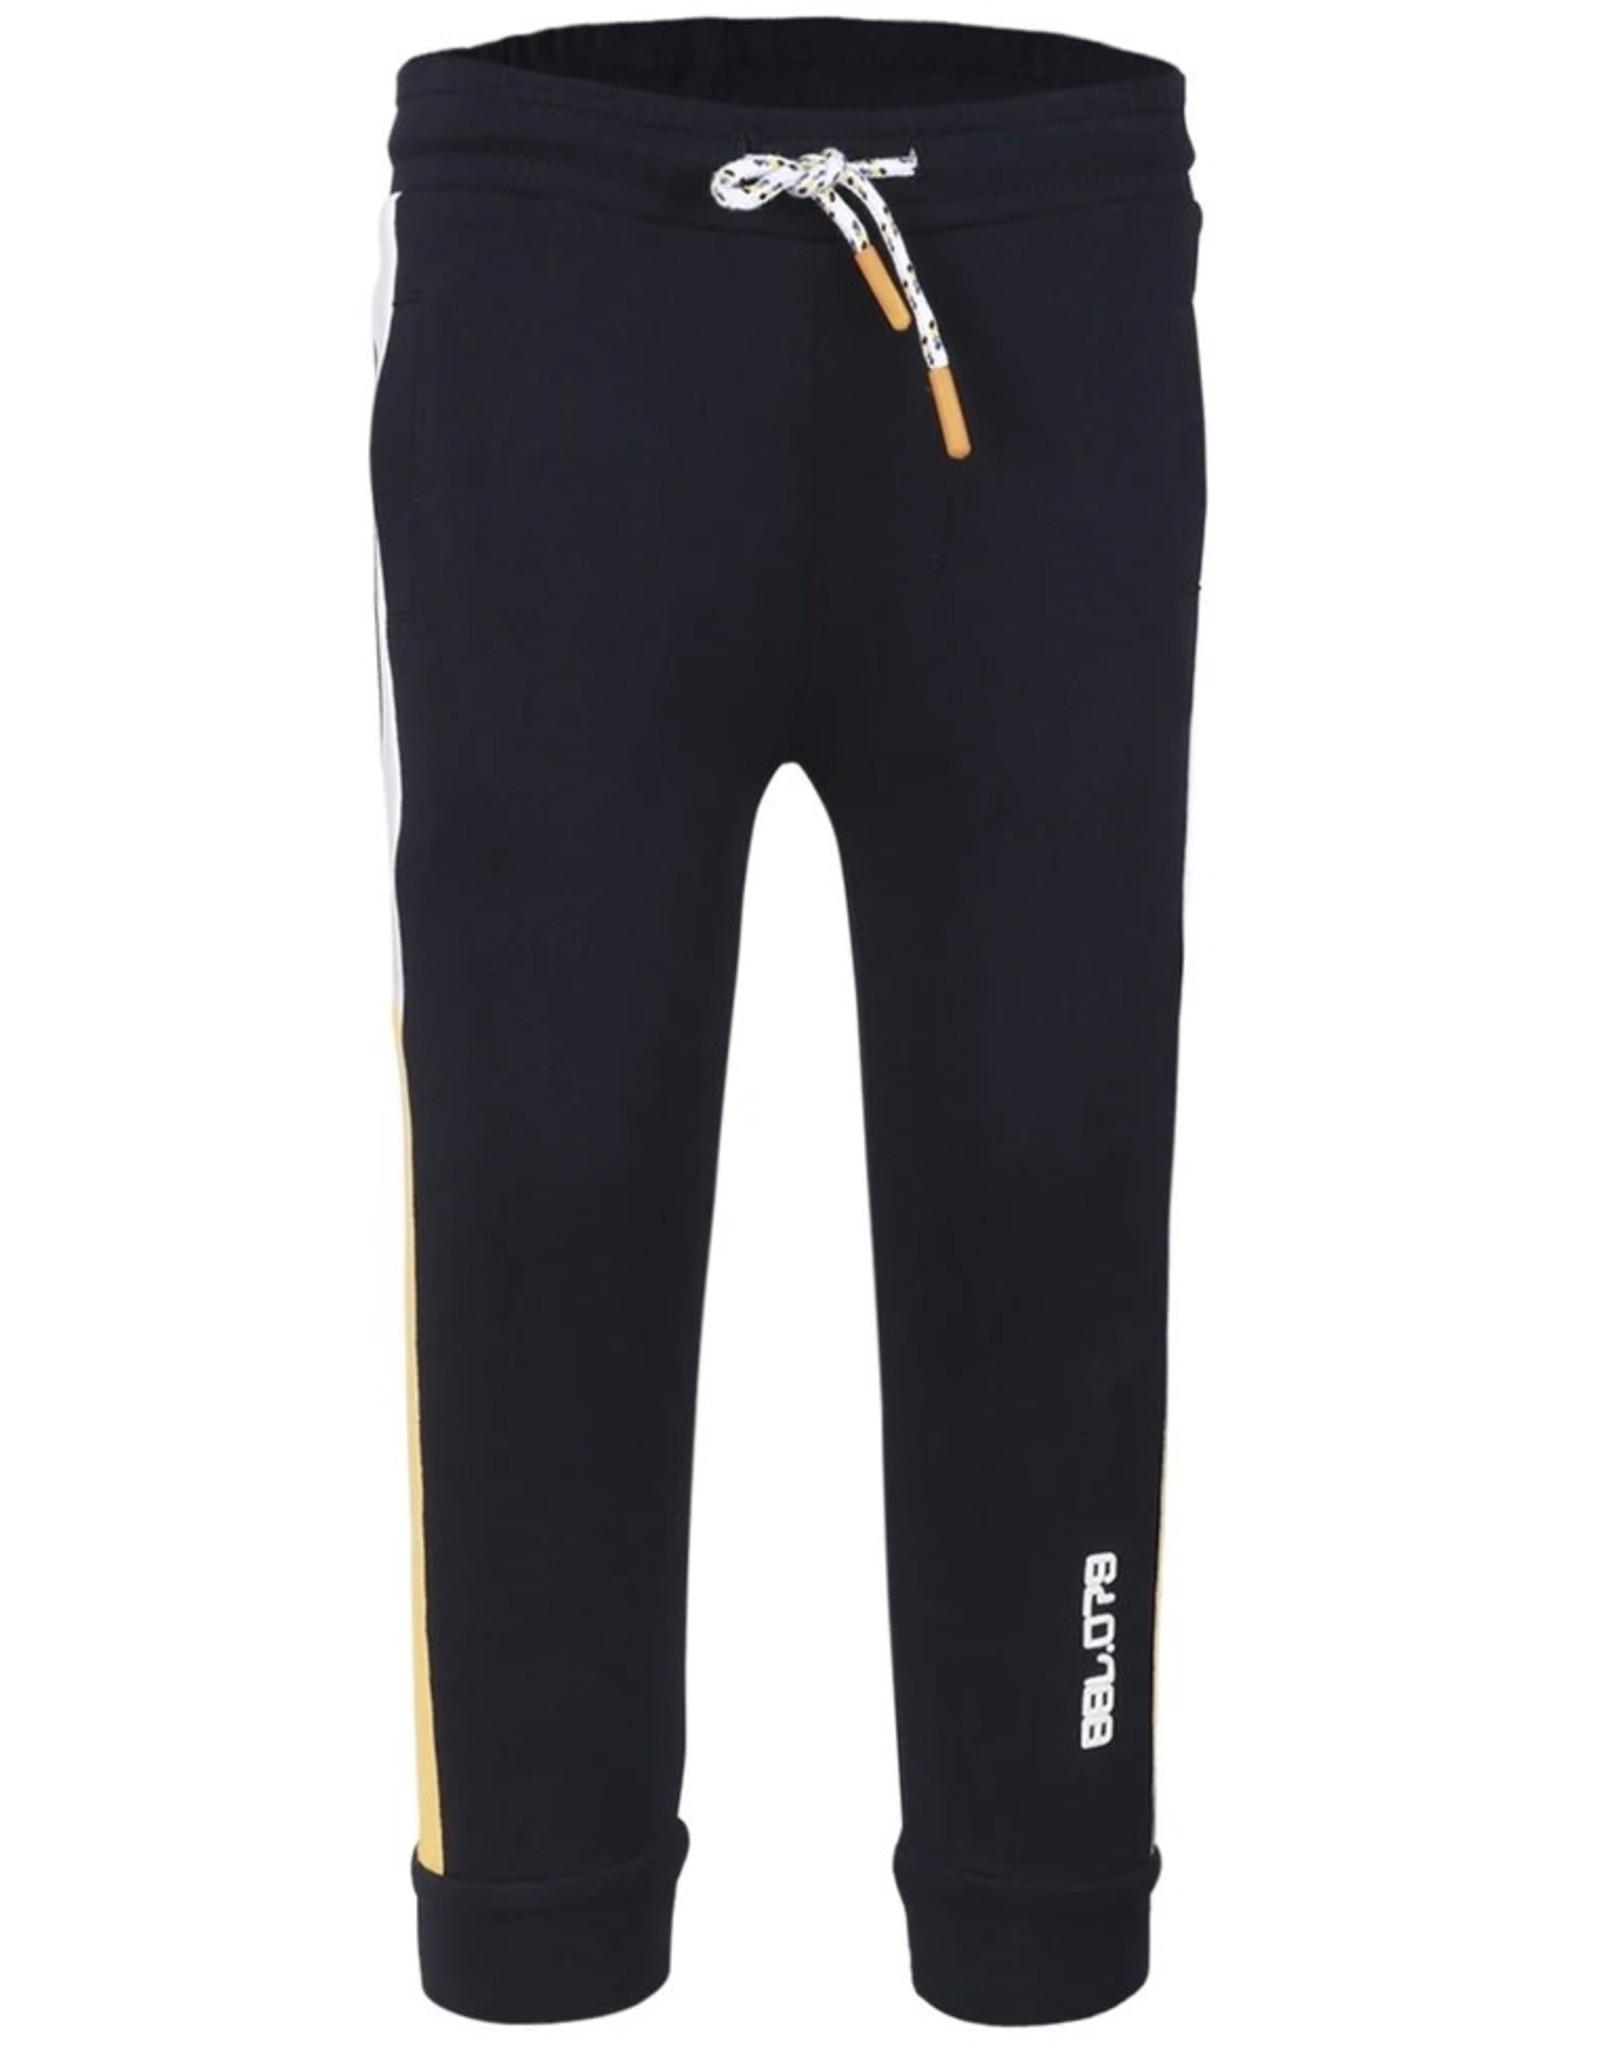 Beebielove 2611 Sweatpants